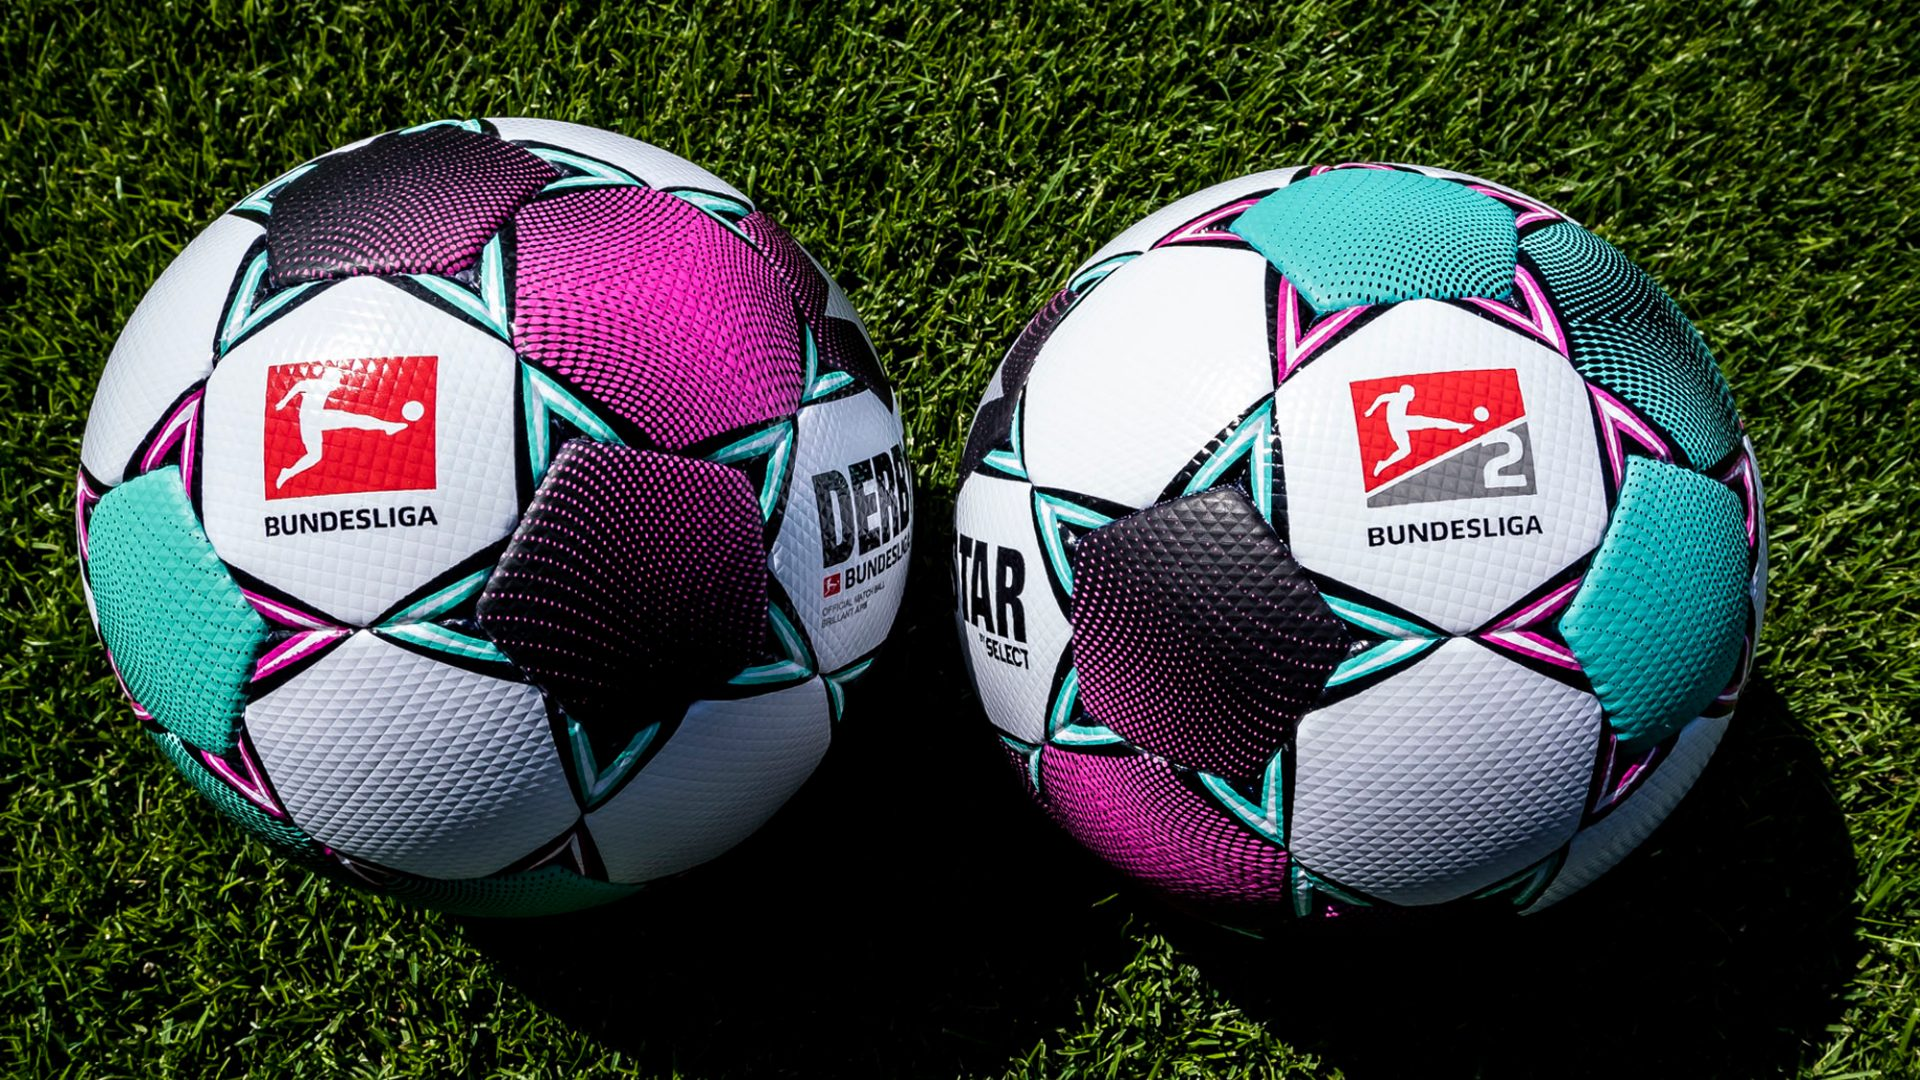 Calendrier Carsat 2022 Calendrier may 2021: Calendrier Bundesliga 2022 2021